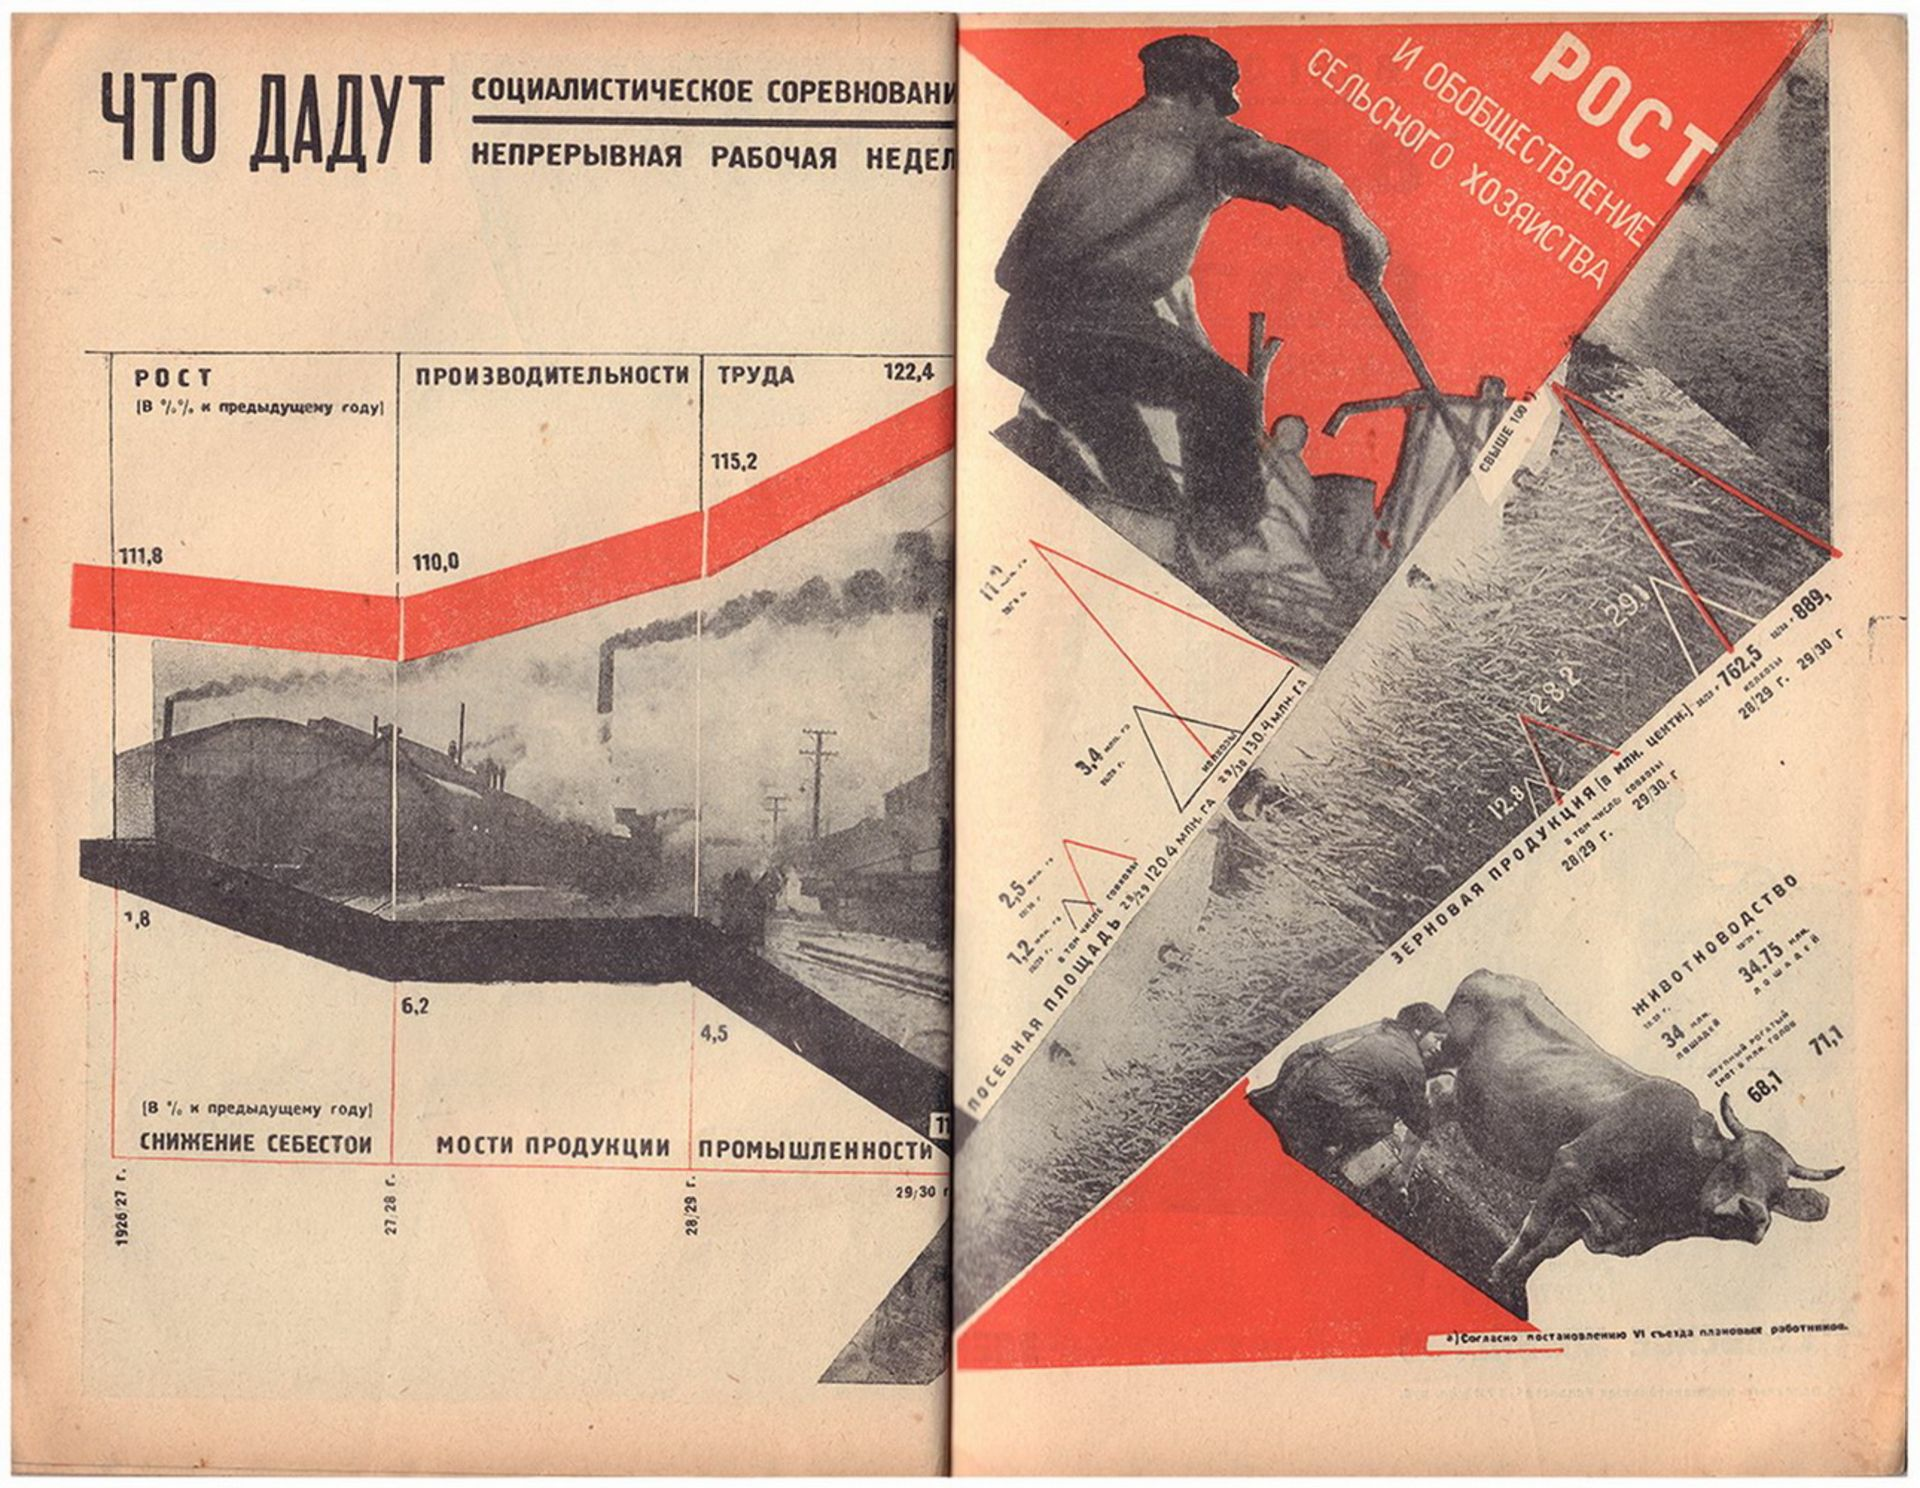 [Gustav Klutsis, photomontages. Rodchenko, A. photographs. Soviet art]. 30 days: Magazine. Issue 11t - Bild 3 aus 3